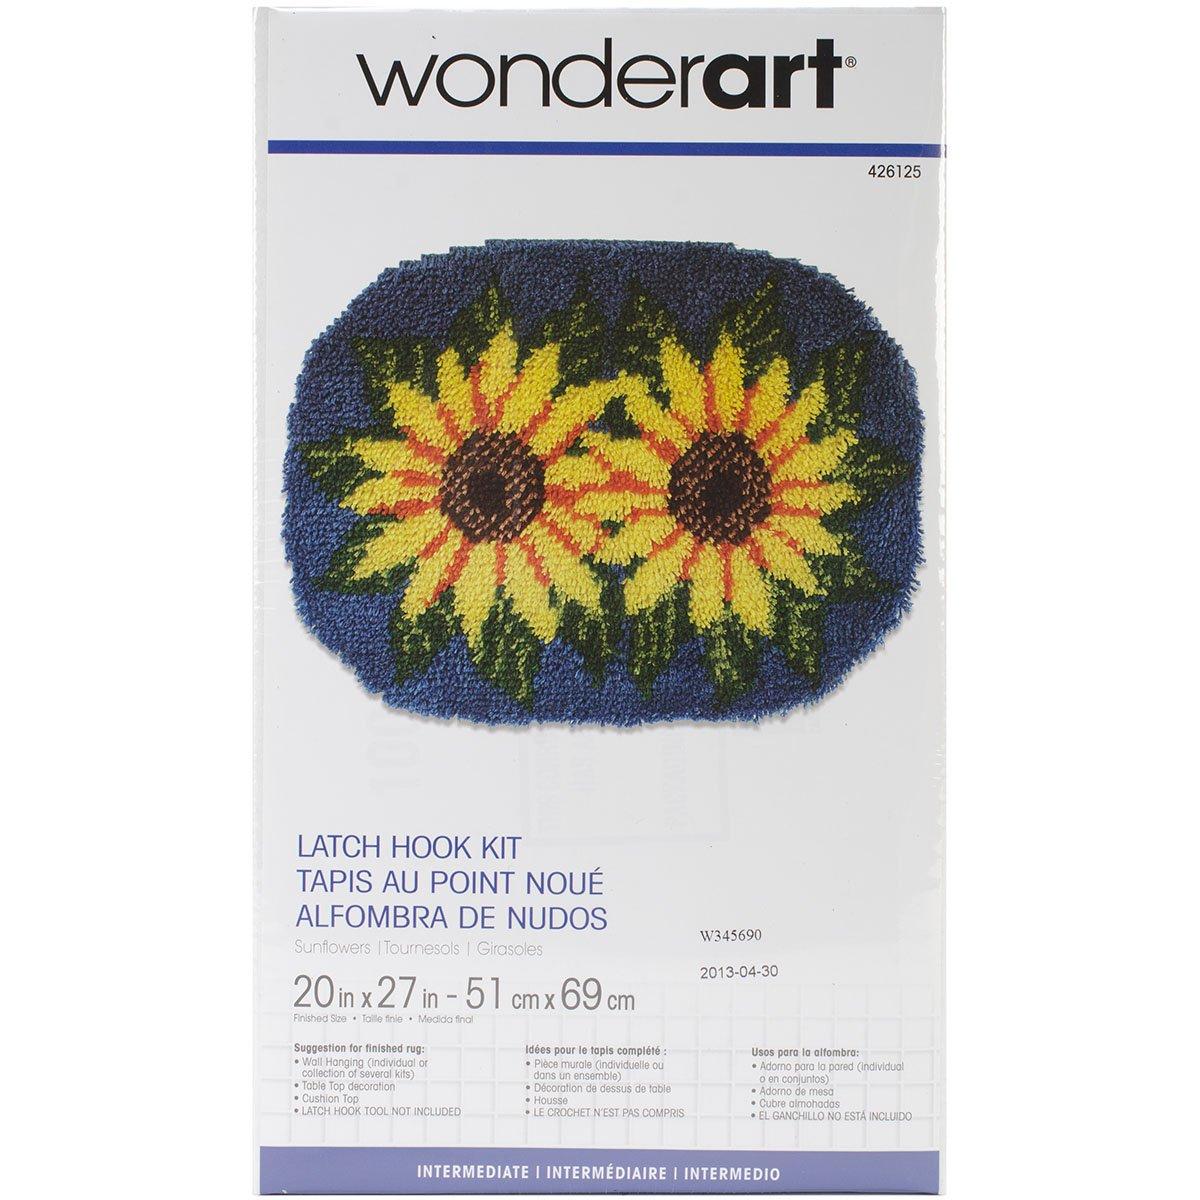 Wonderart Latch Hook Kit 20x 27 Sunflowers